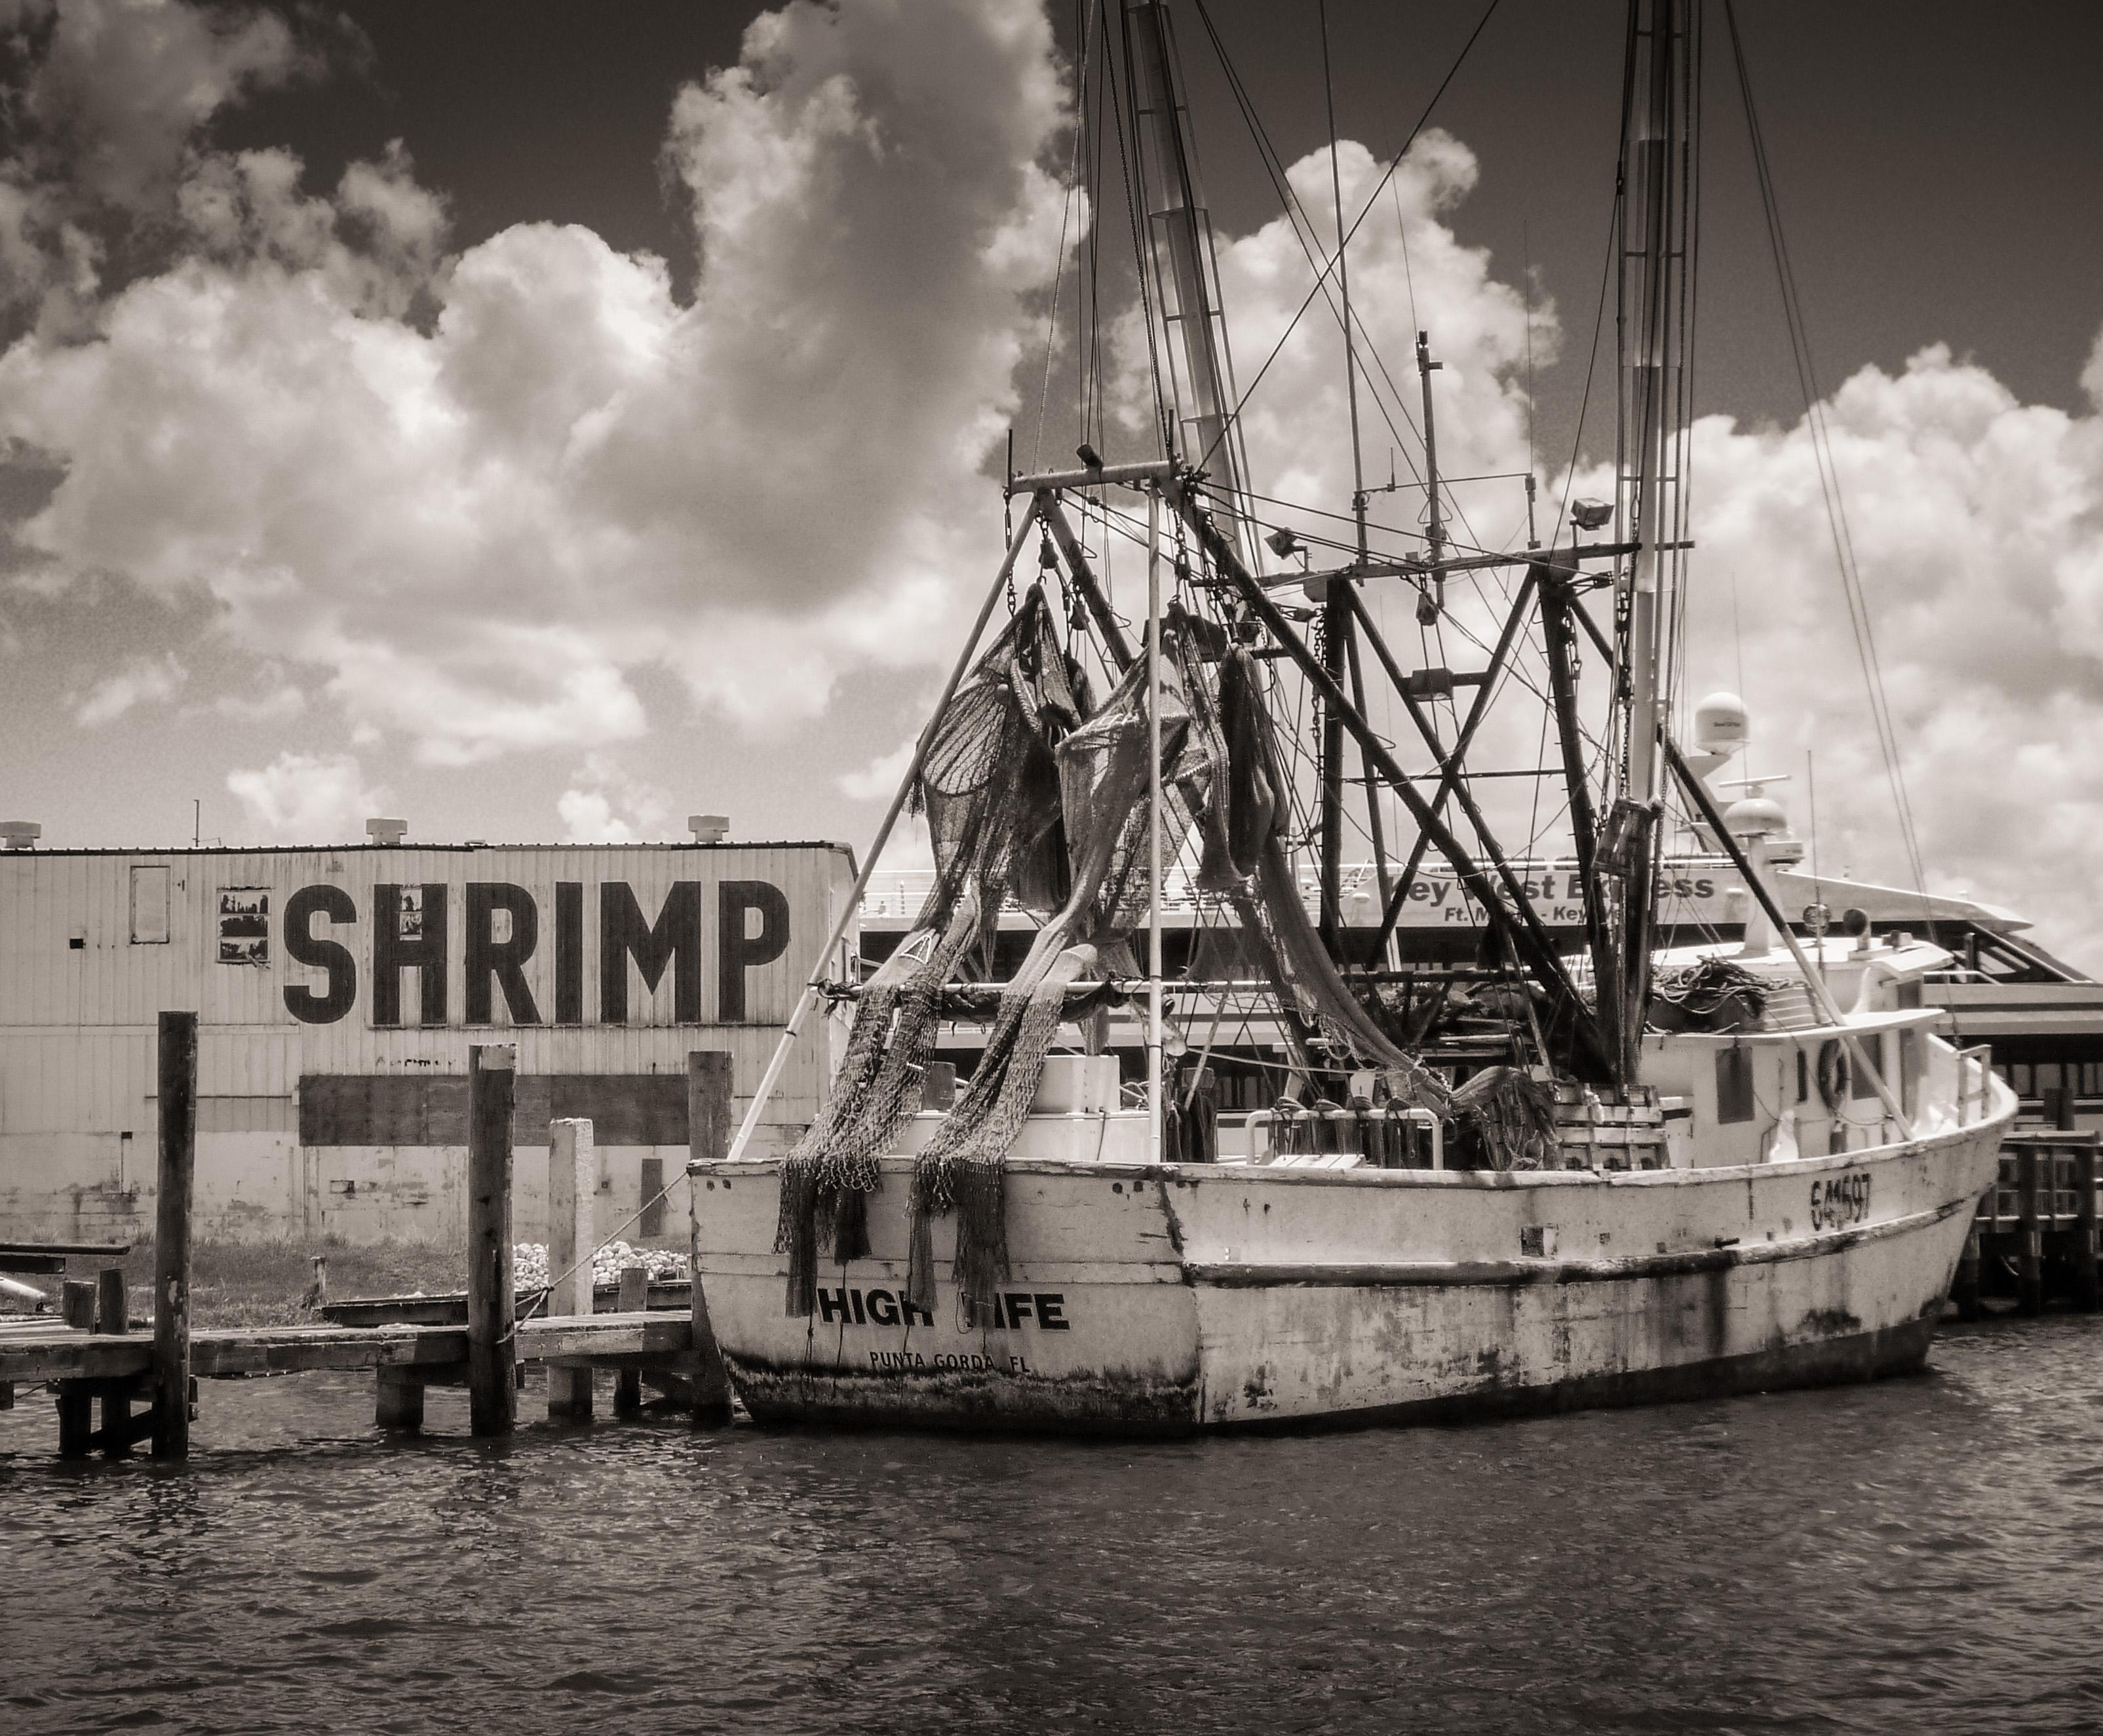 """High Life"" Shrimp Boat at Dock"